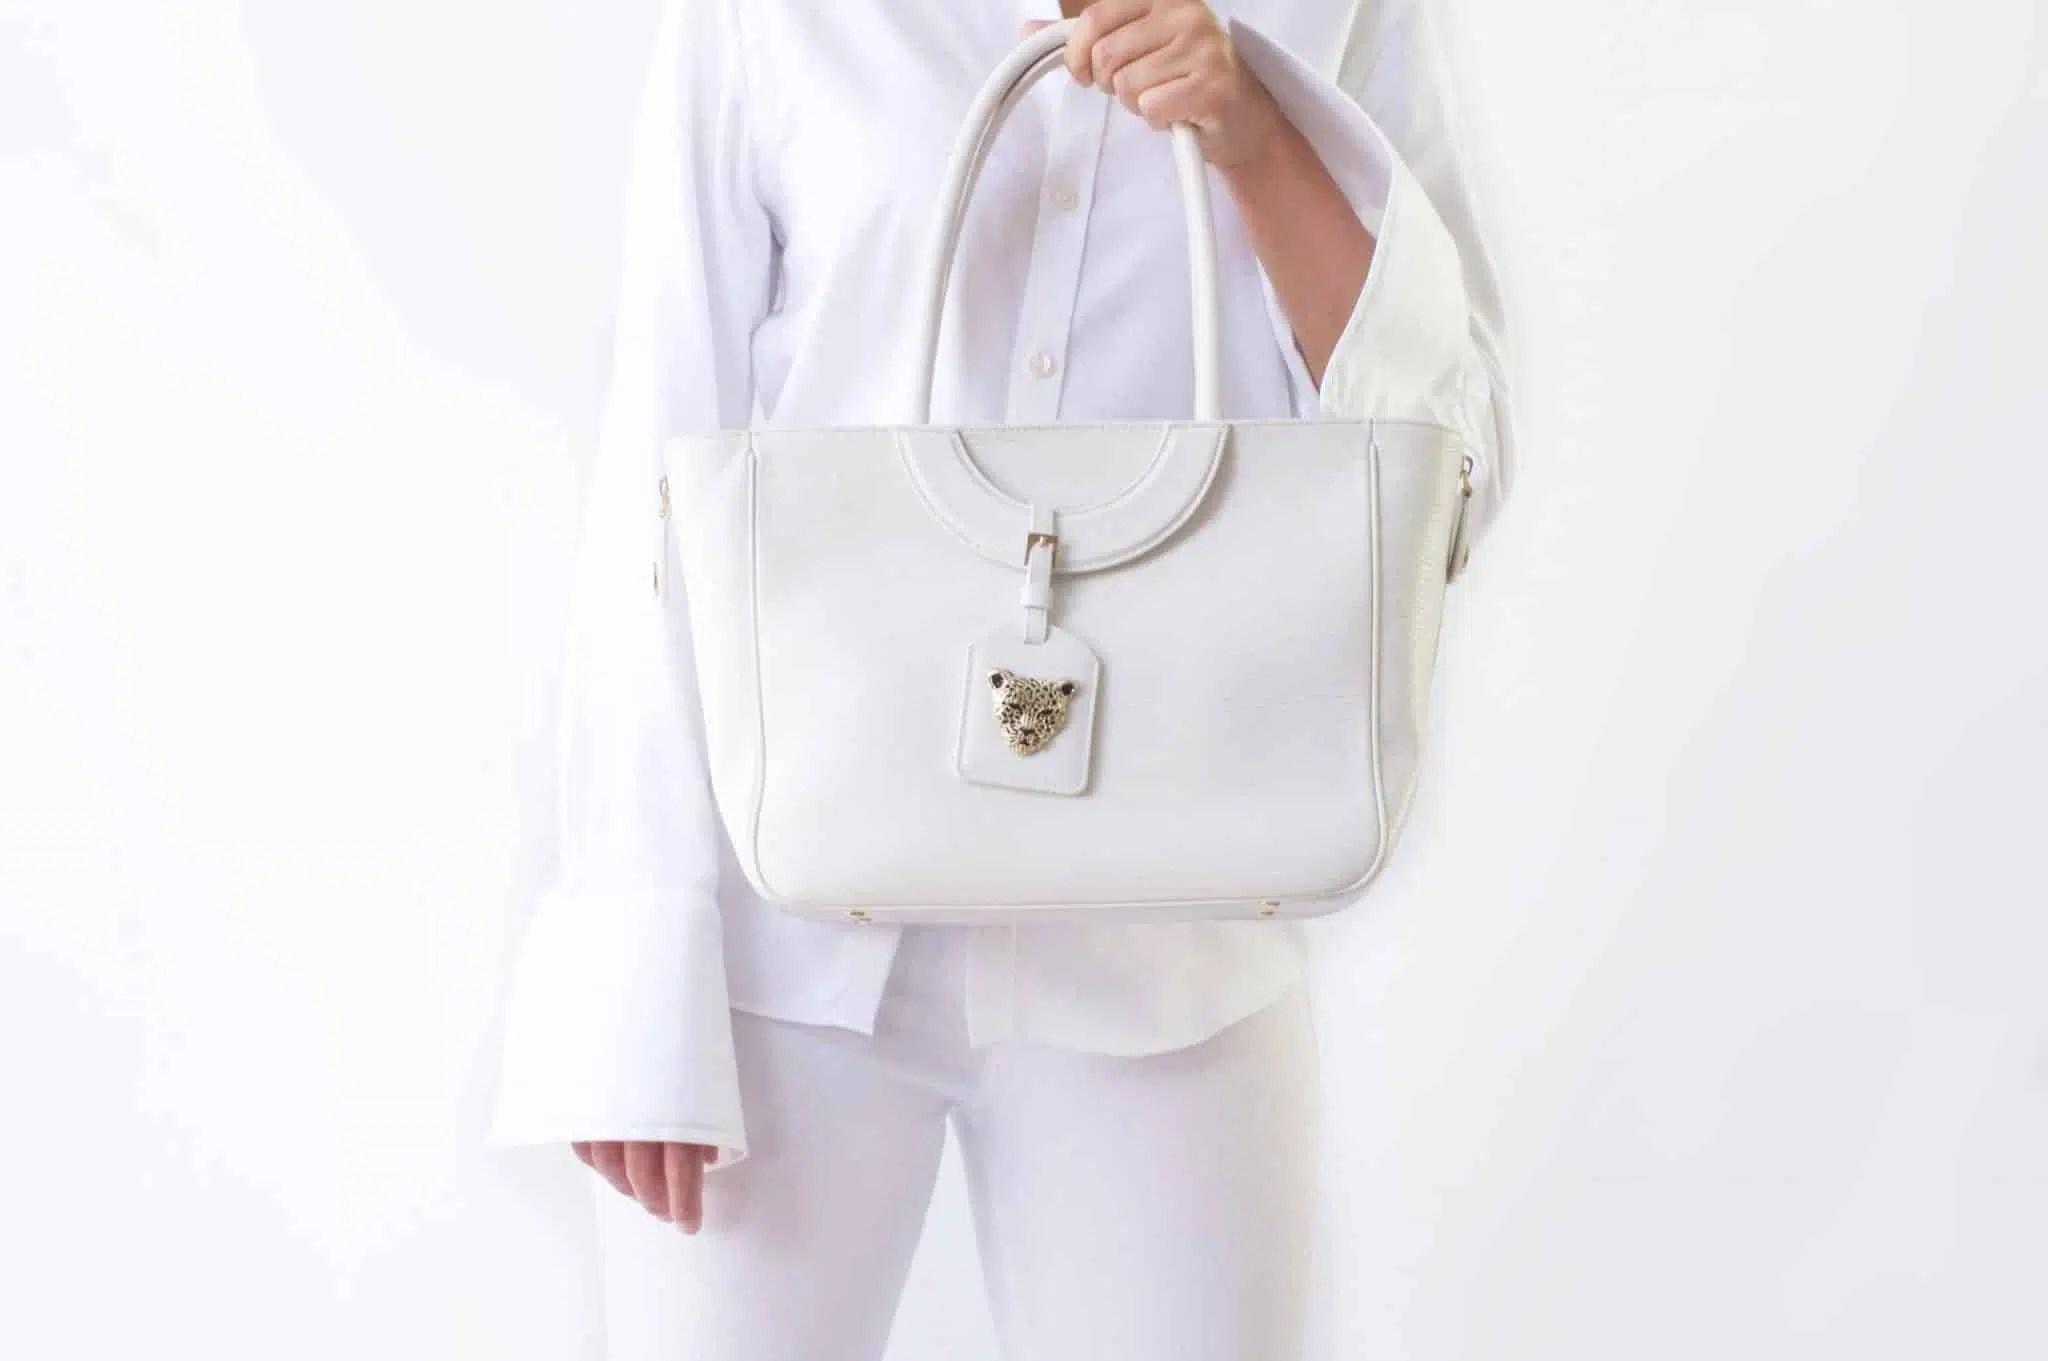 Mezzaluna Tote Bag in White